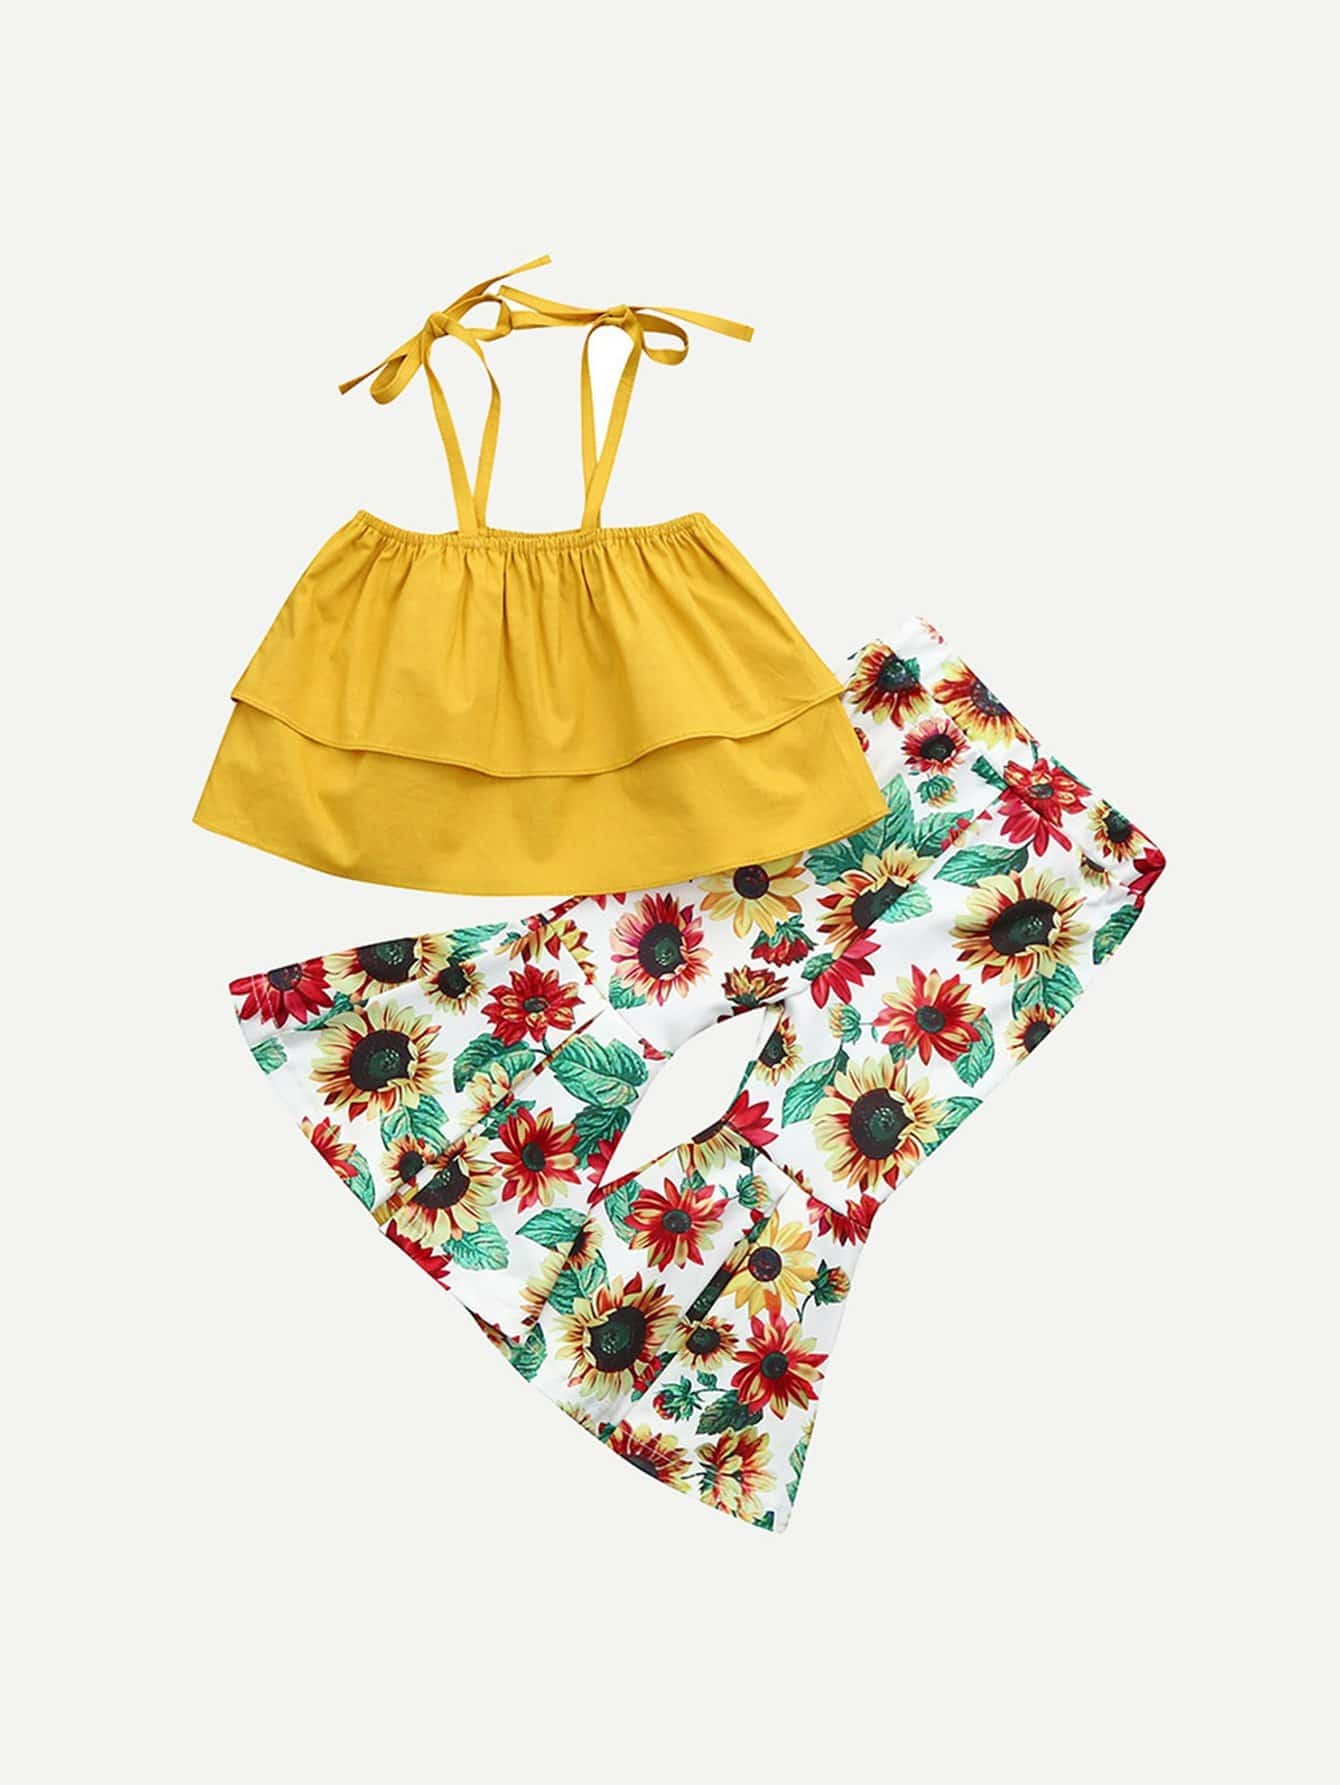 Girls Ruffle Trim Cami Top With Sunflower Print Flounce Pants